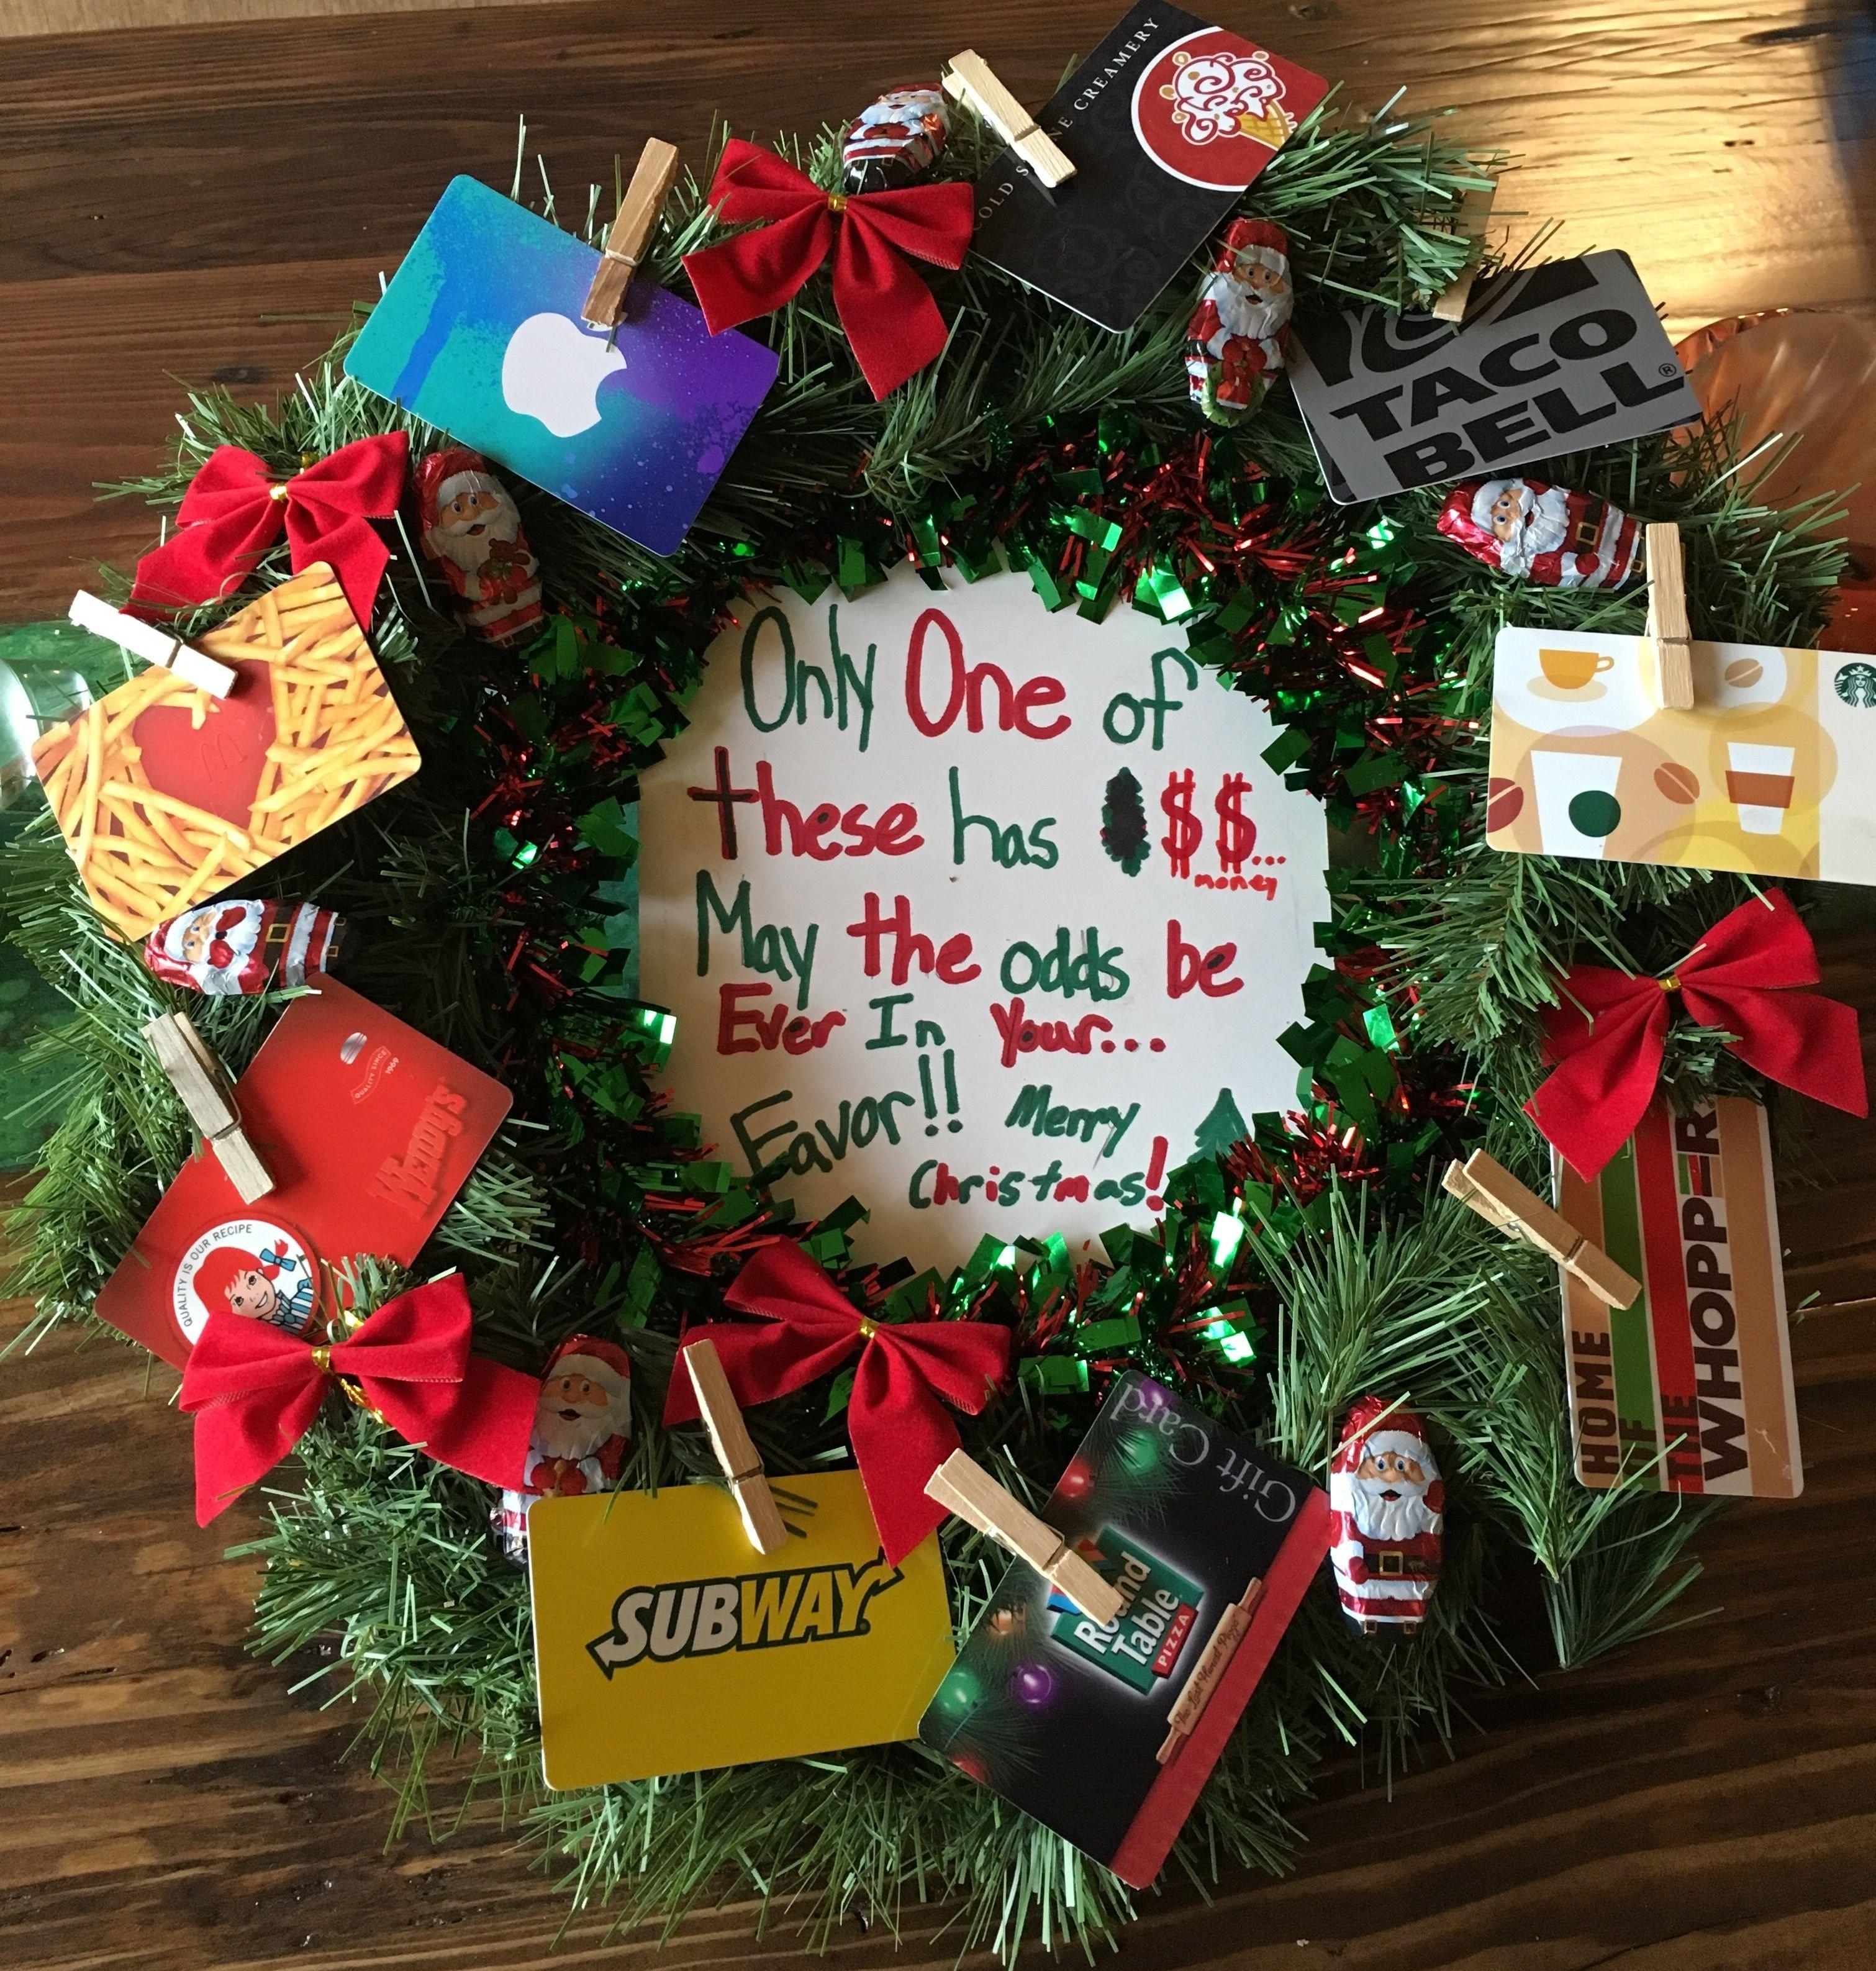 10 Amazing Gag Gift Ideas Christmas Party fun white elephant gift idea white elephant gift pinterest 2020